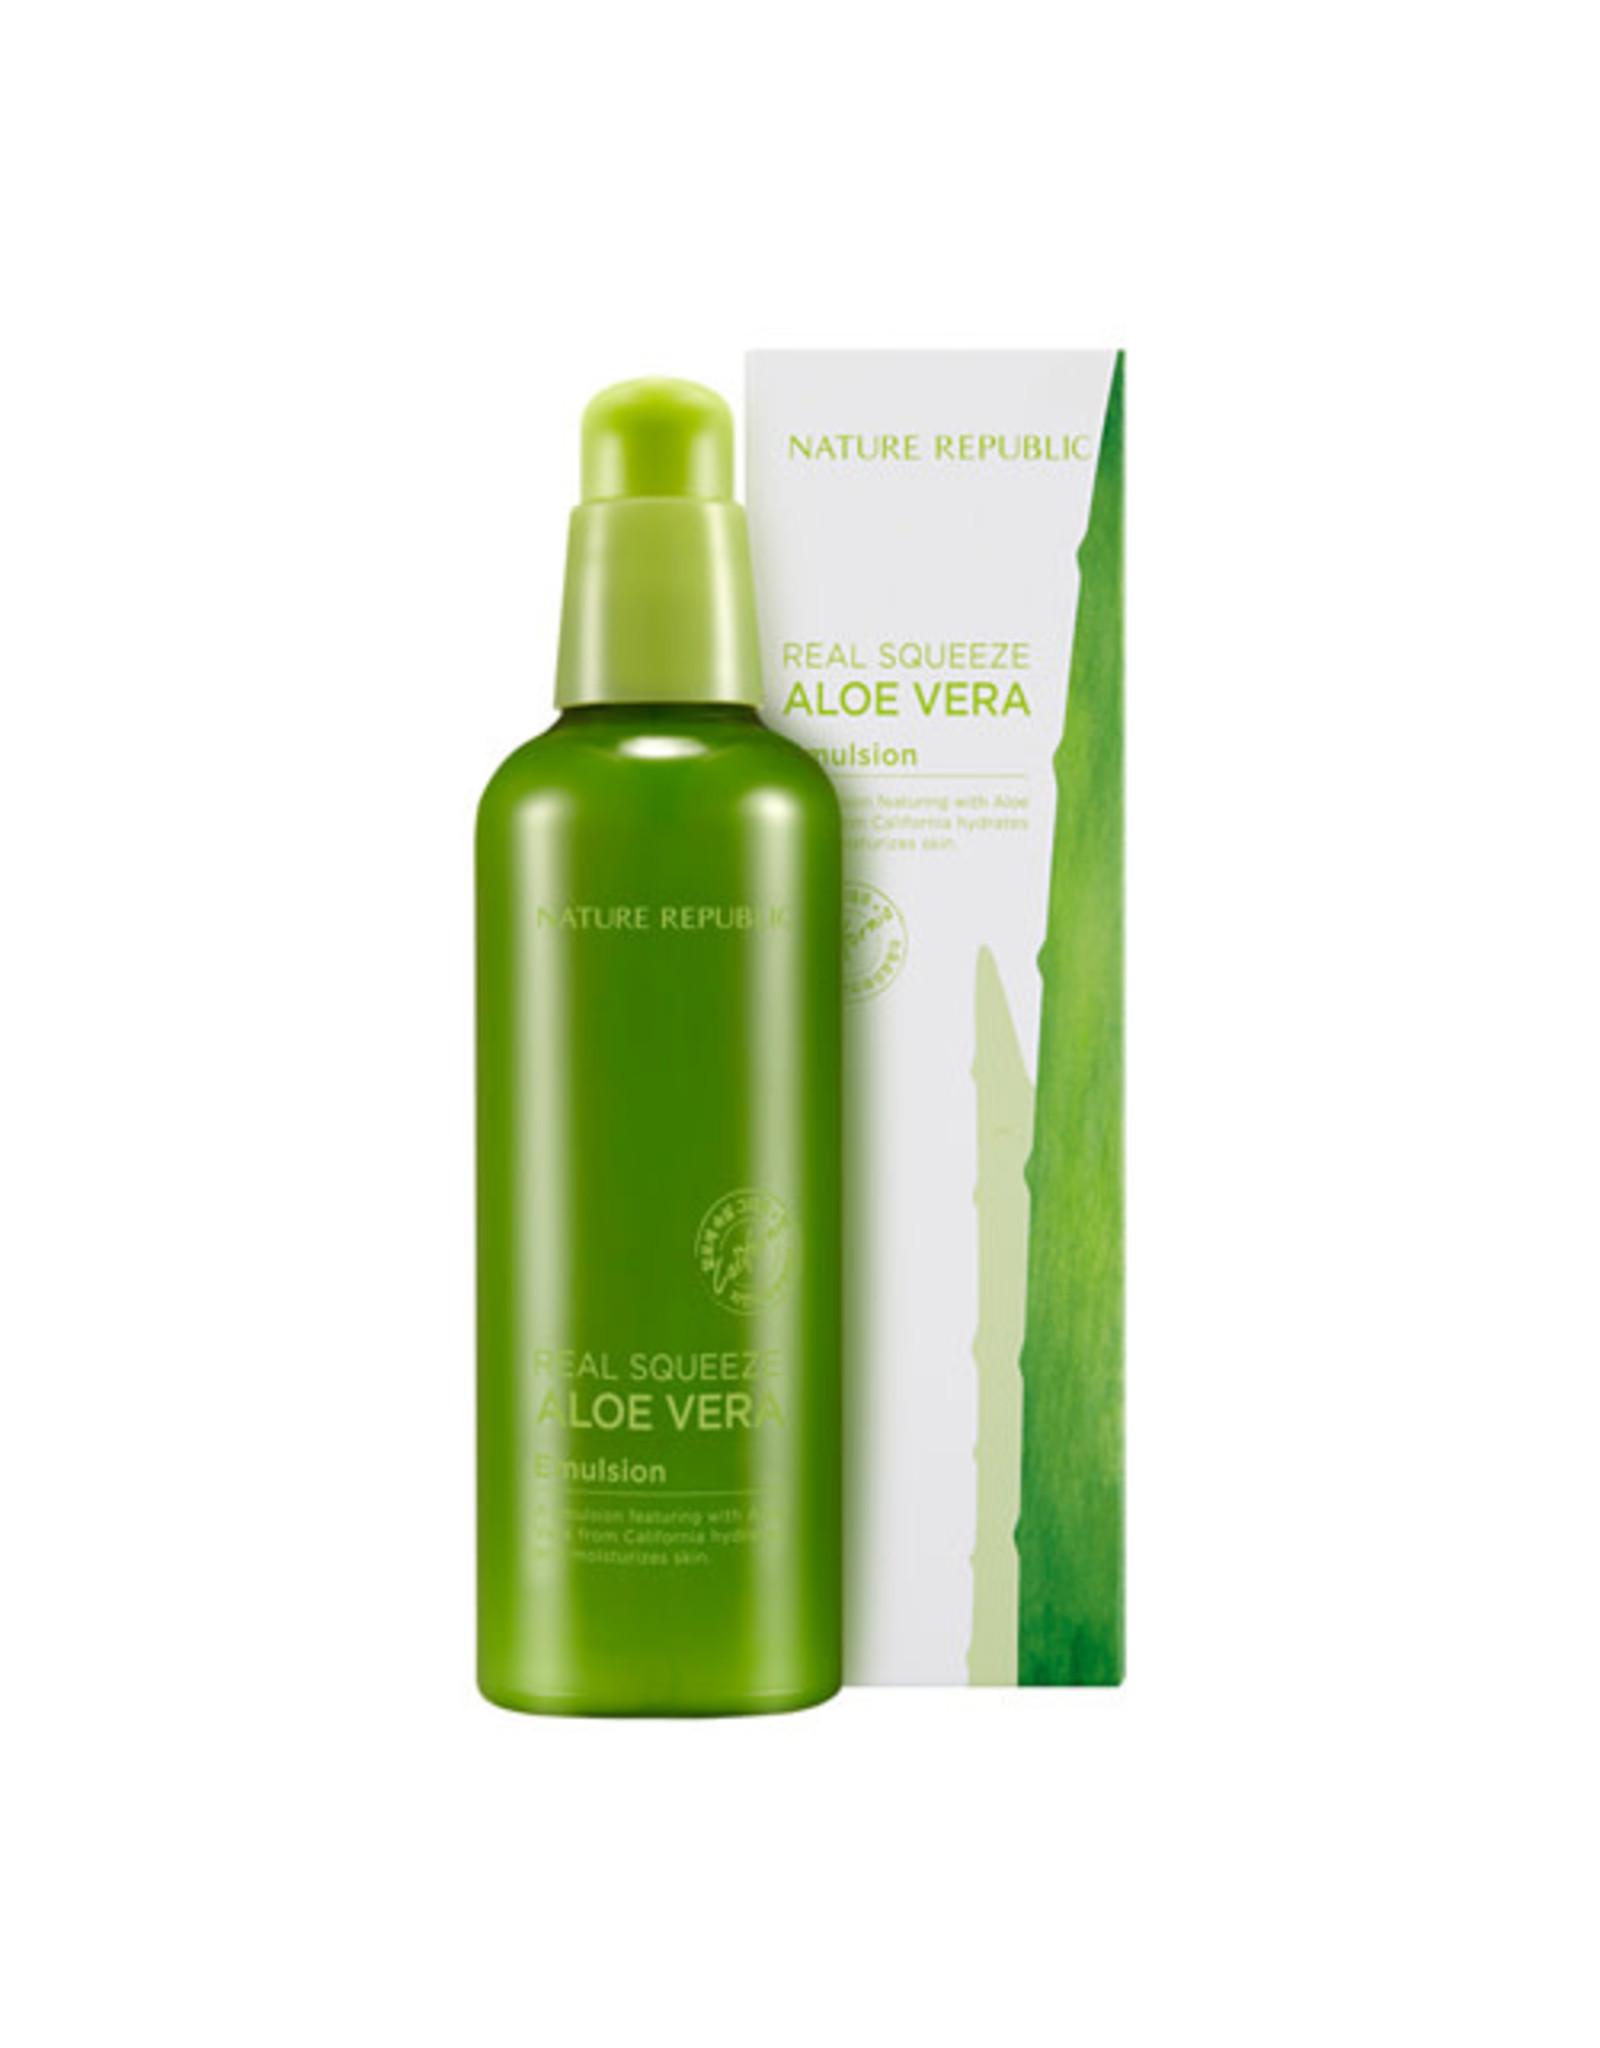 Real Squeeze Aloe Vera Emulsion